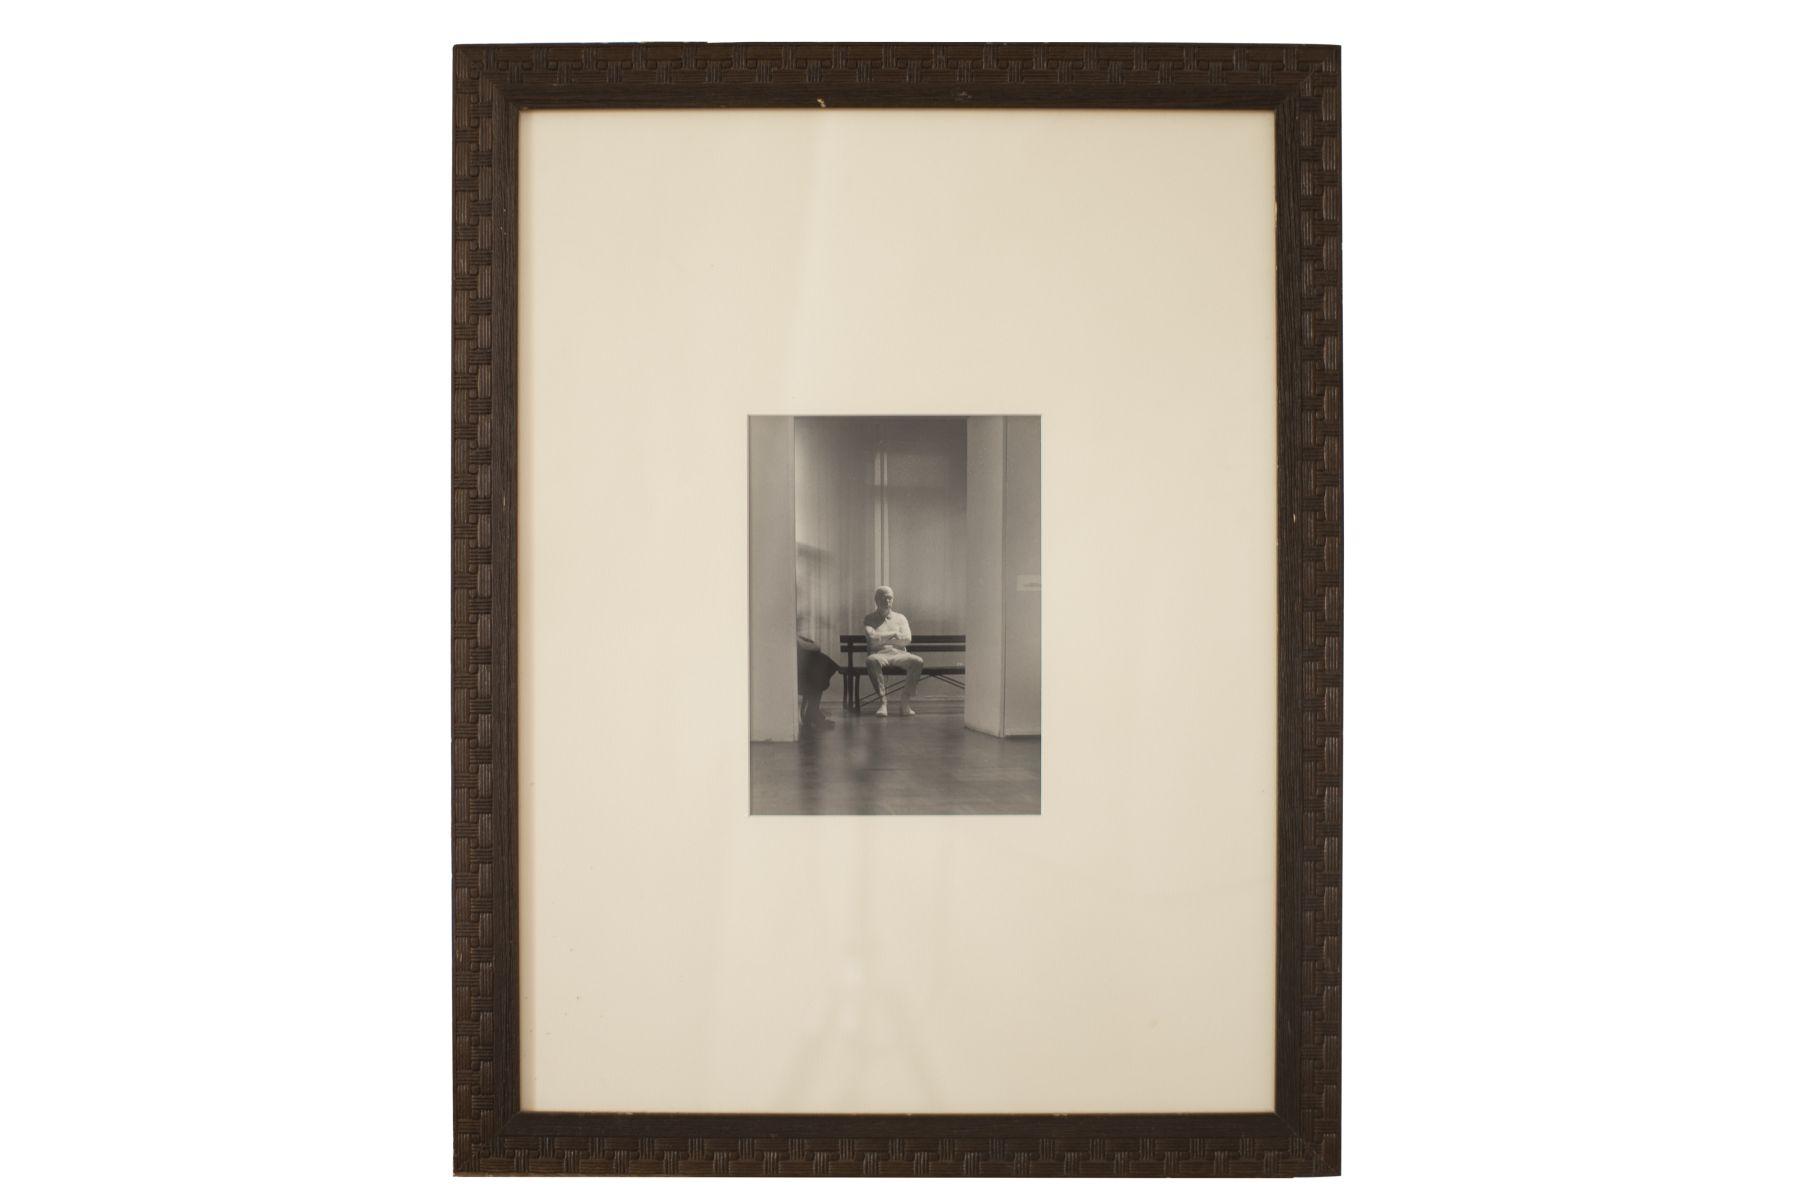 #153 Deoraz Sigl, Man in the Waiting Room, Photo, Venice, Around 1980 | Deoraz Sigl, Mann im Warteraum, Foto, Venedig, um 1980 Image